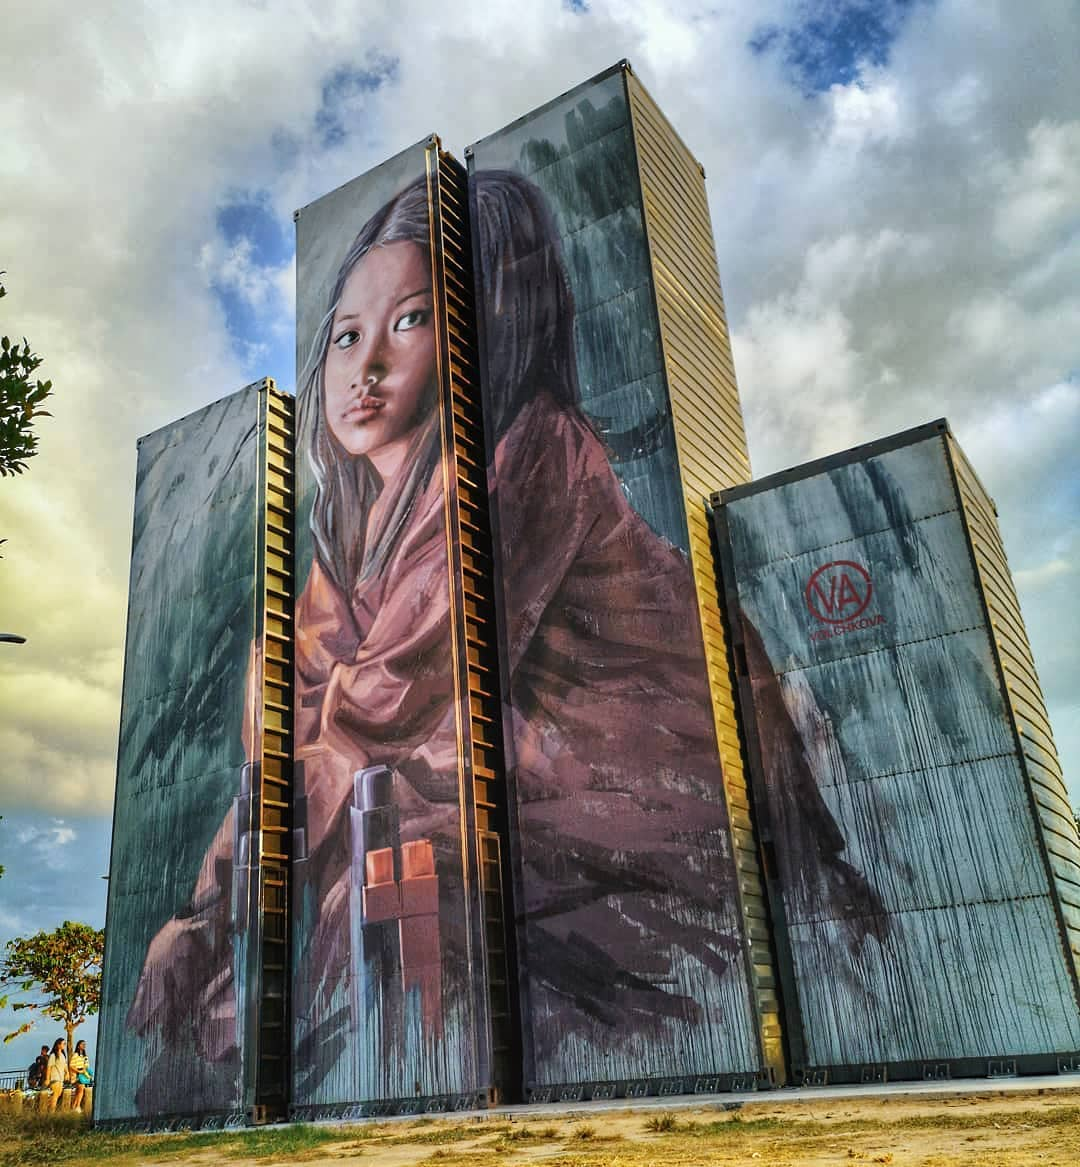 Julia Volchkova @ George Town, Penang, Malaysia